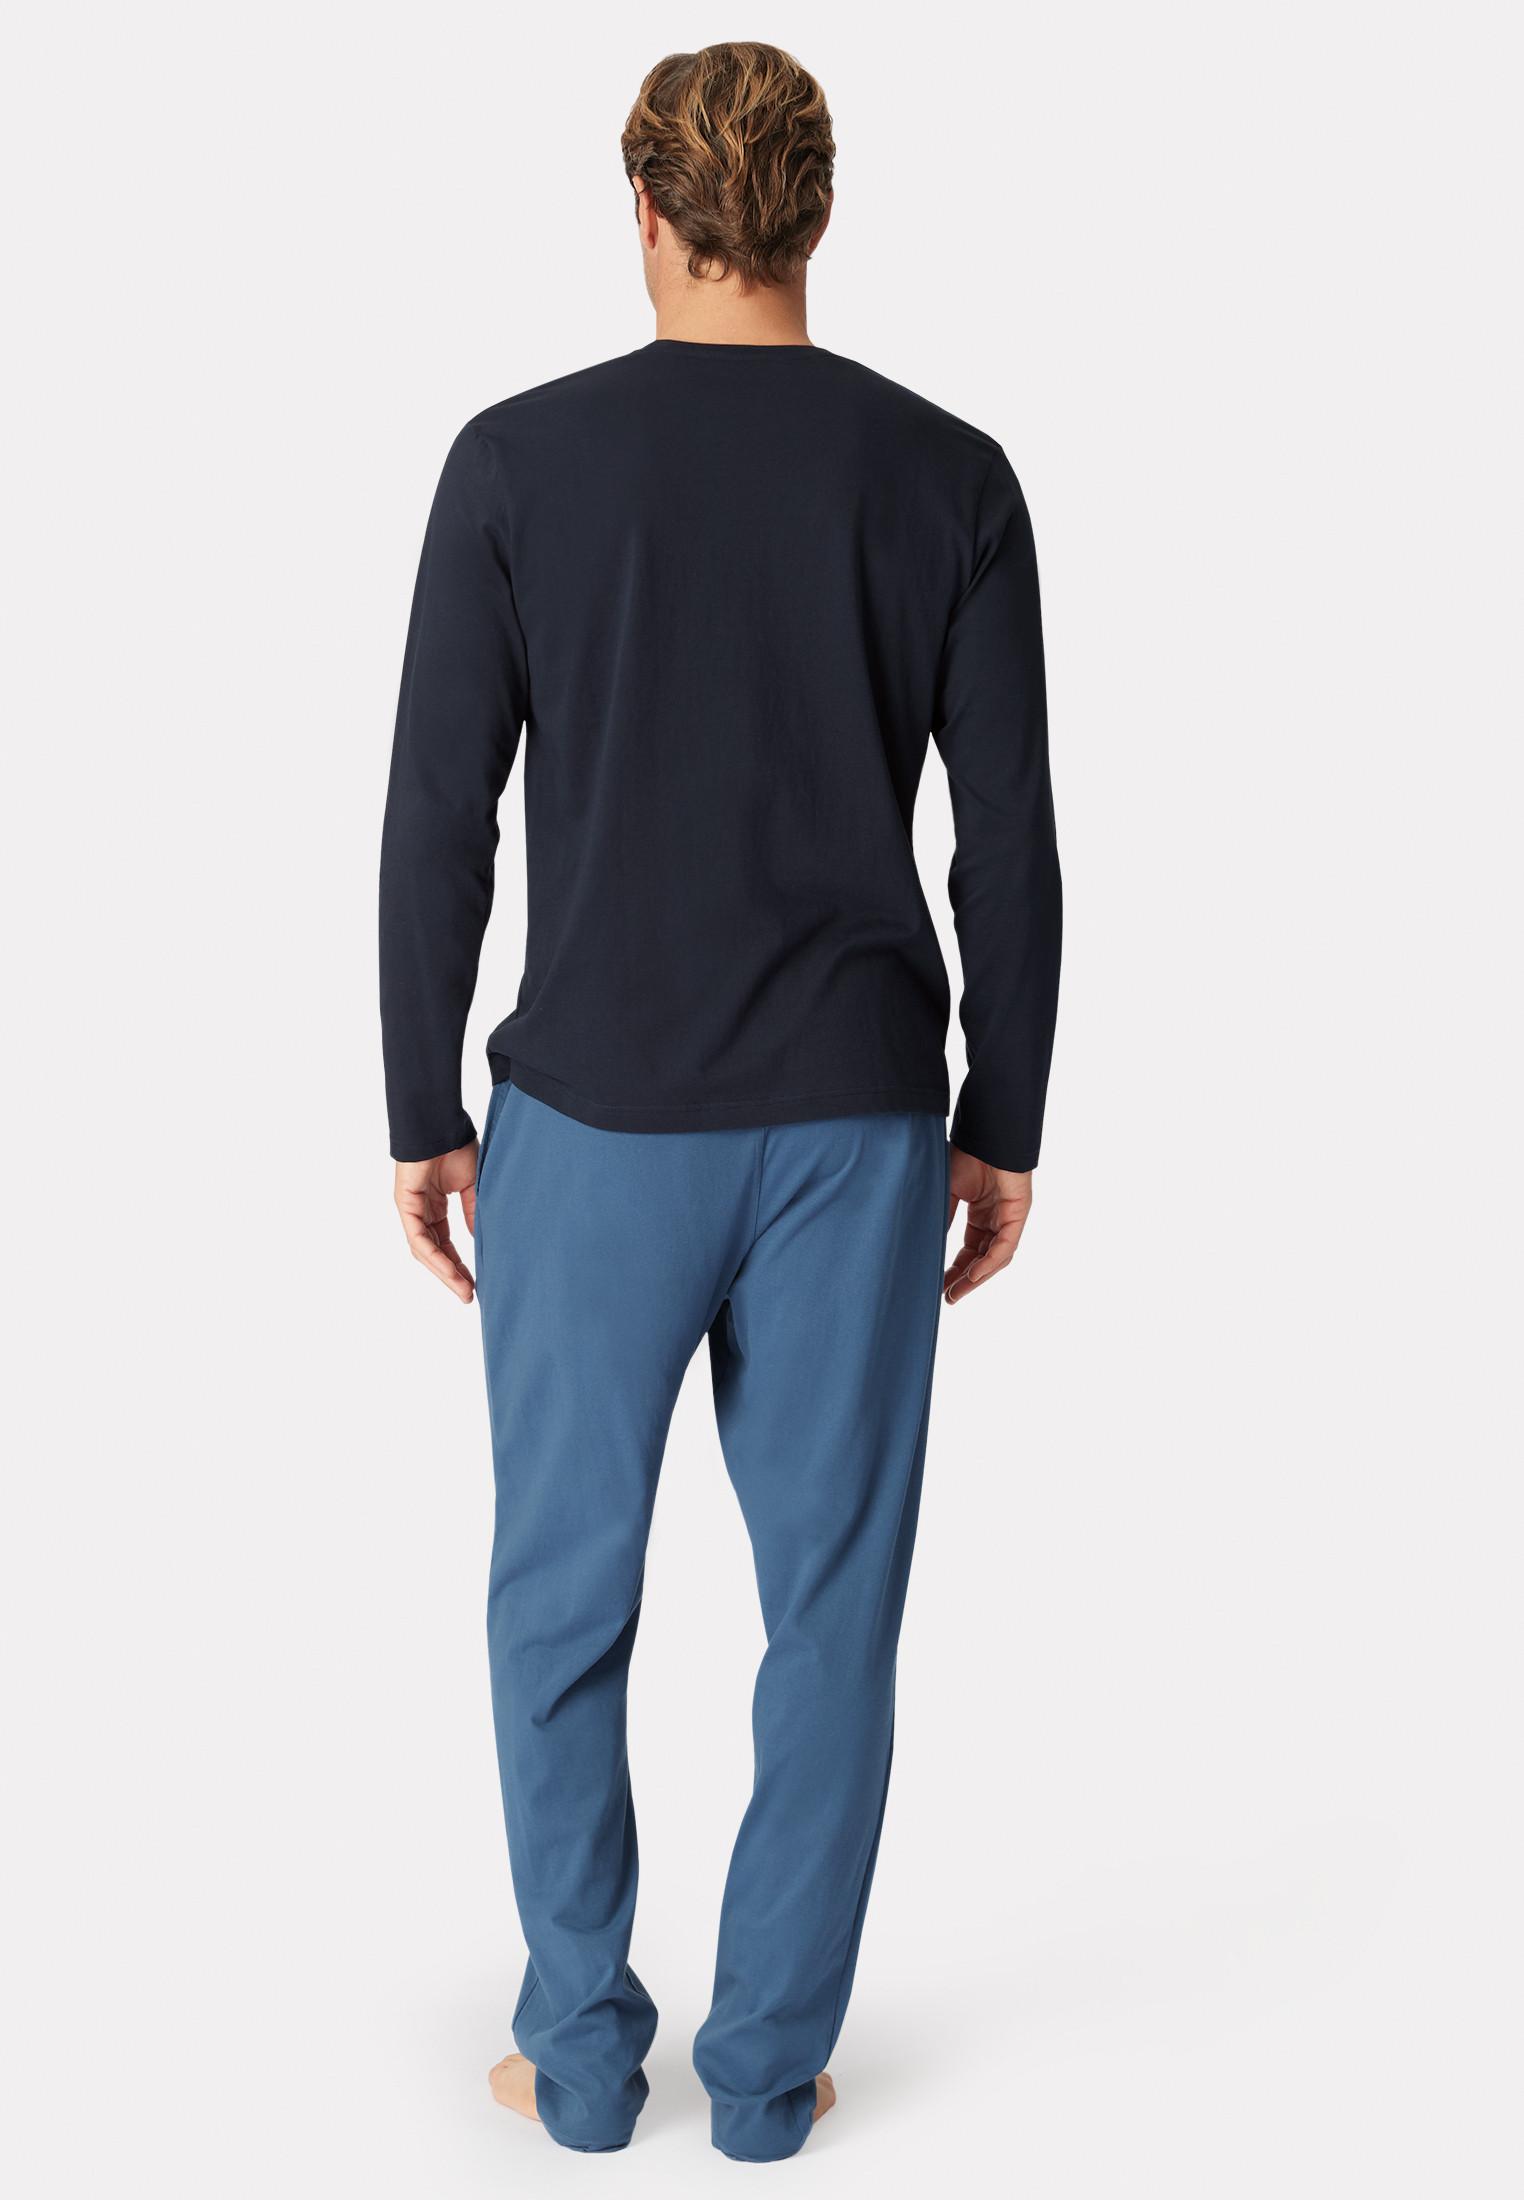 Arnold Long Sleeve Navy Crew Neck T-Shirt